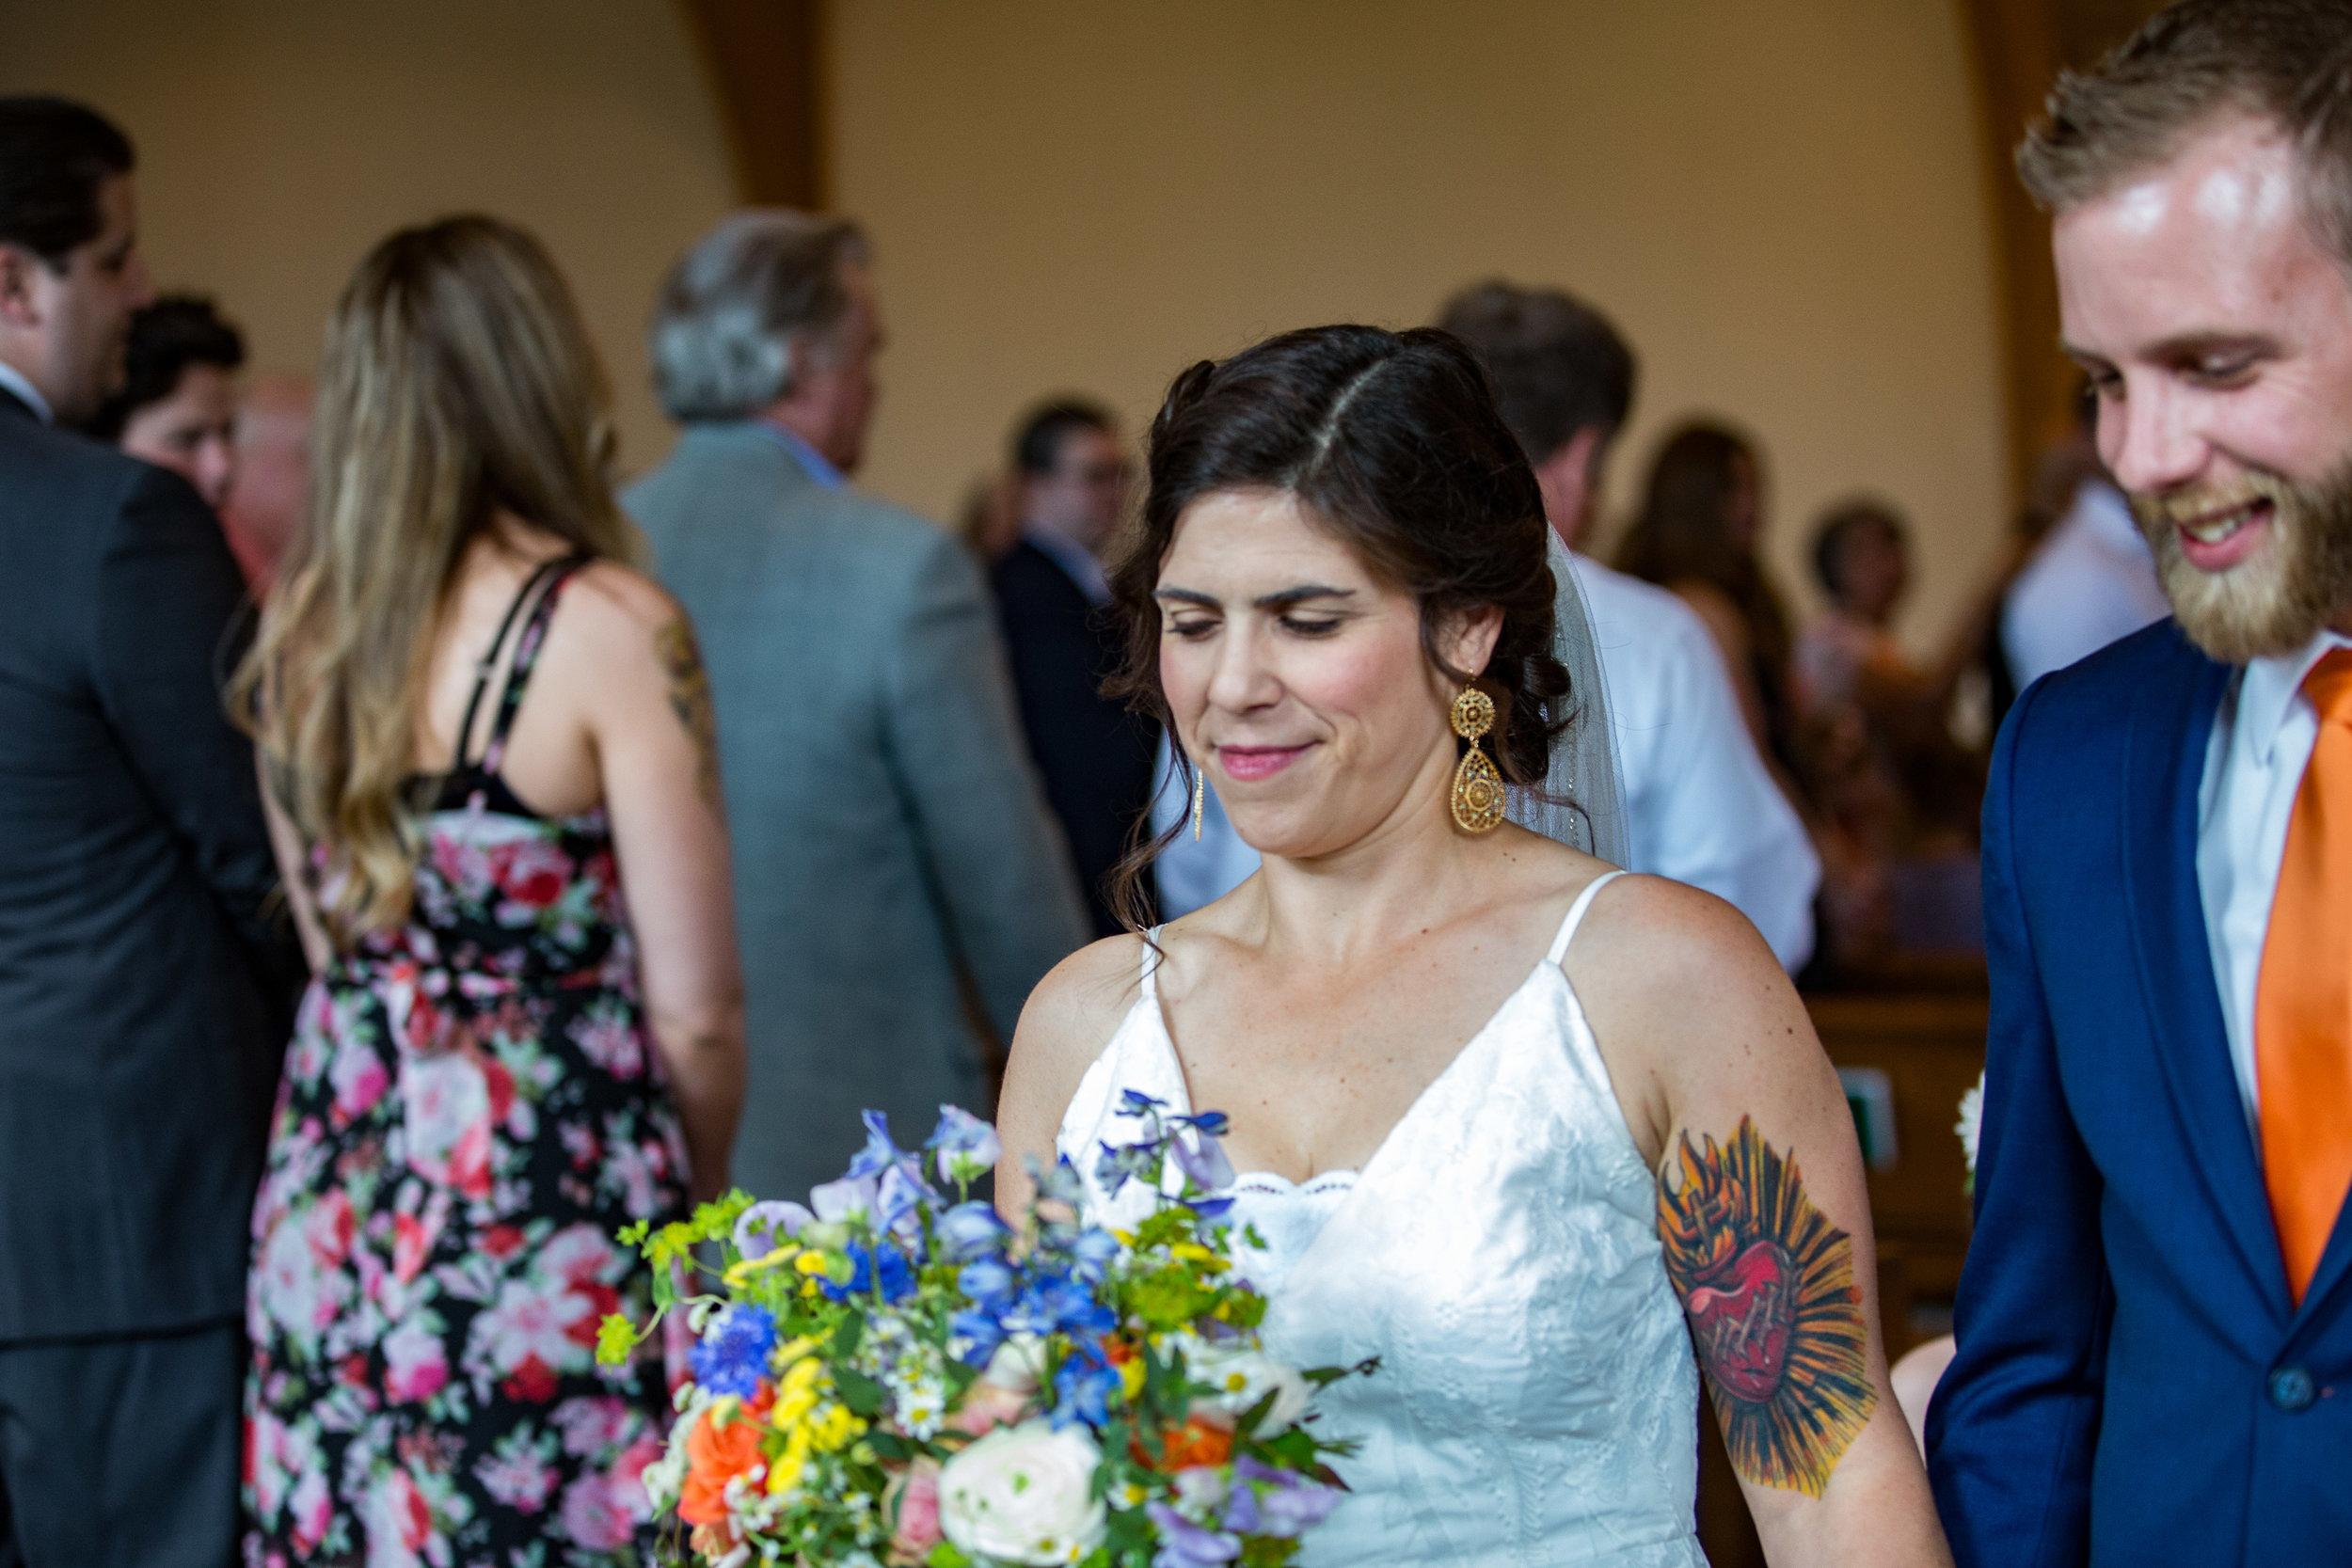 Natalie and Dallas Mooney Wedding 6-8-19_Tania Watt Photography-151.jpg